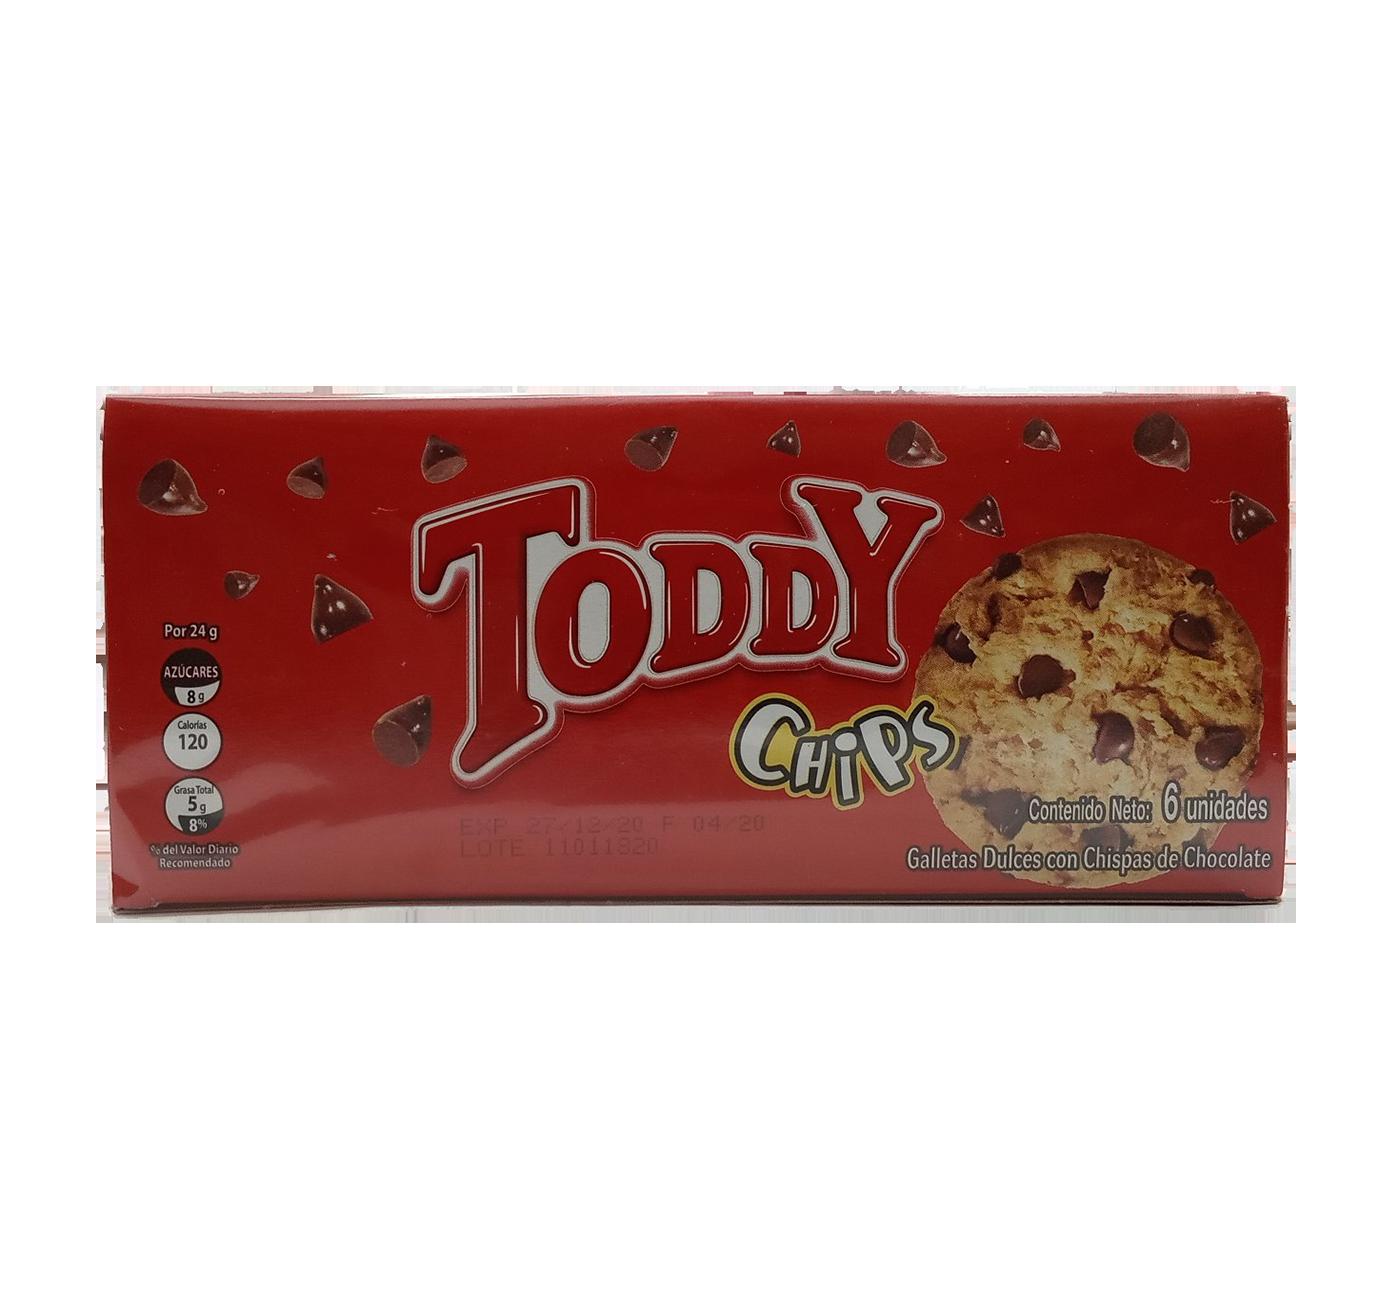 TODDY GALLETAS CHIPS 24GR